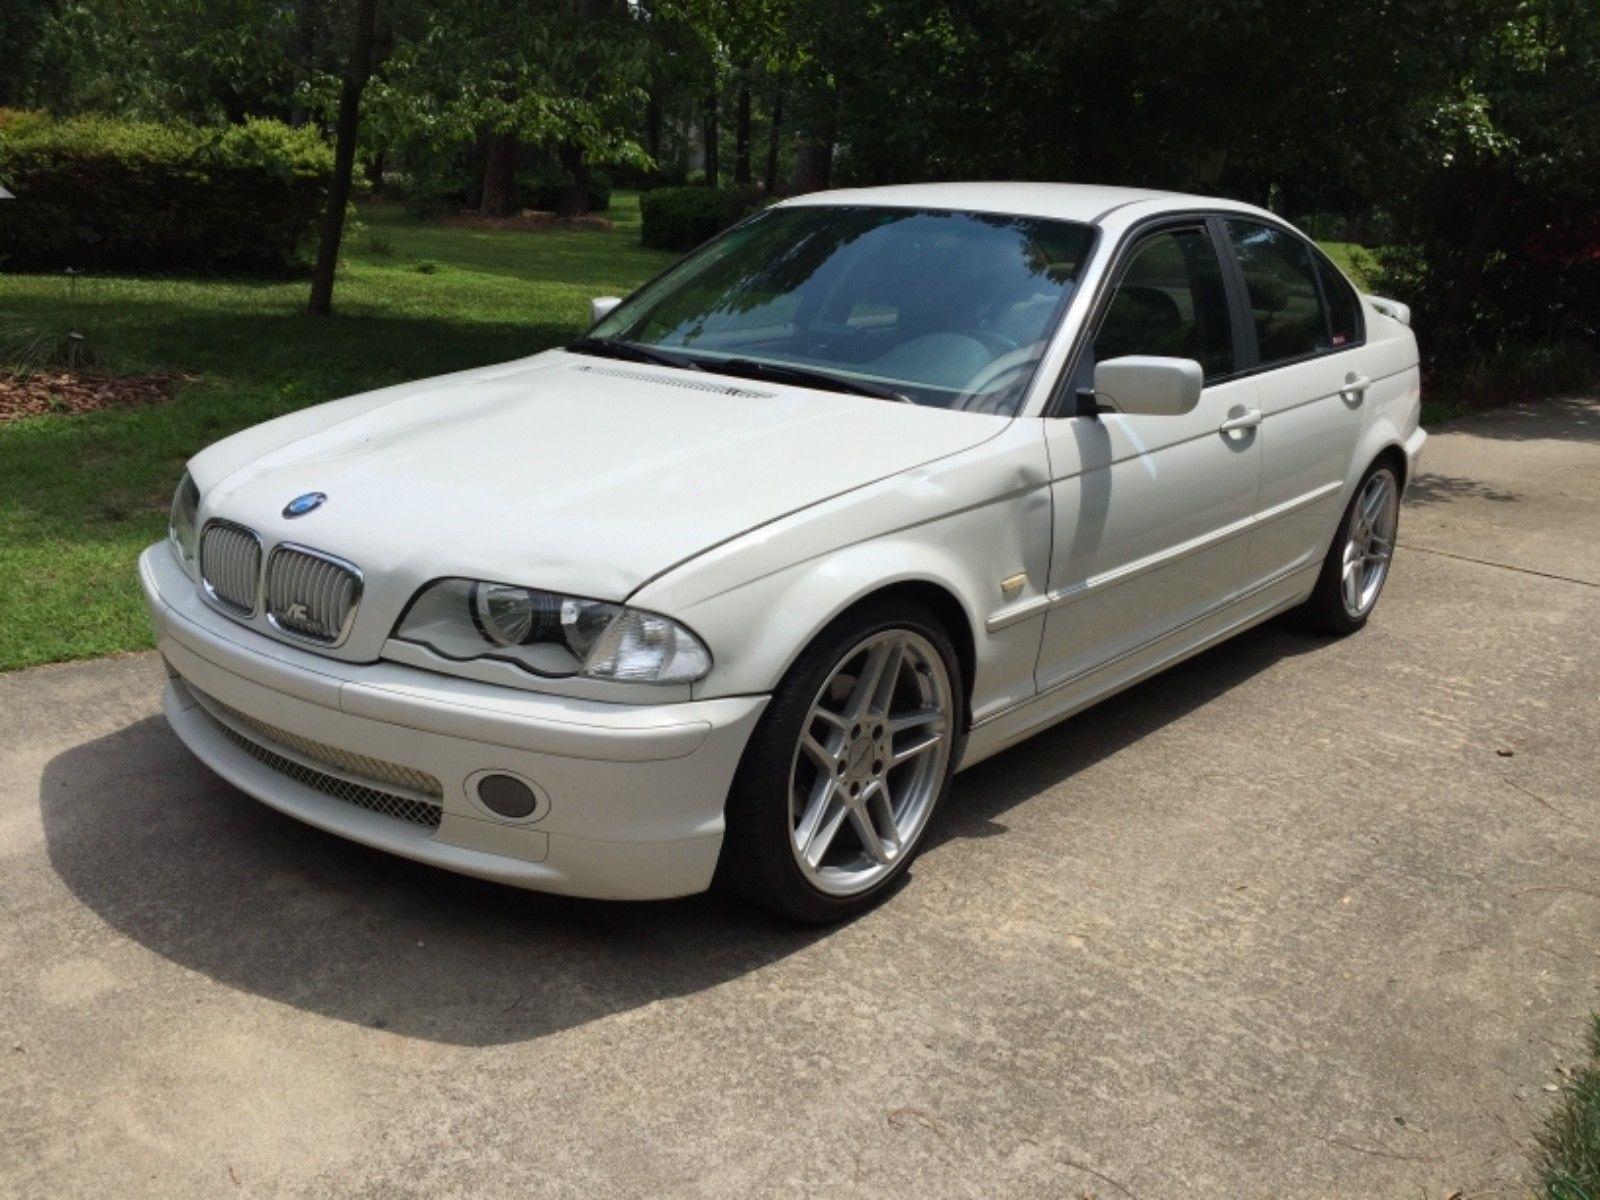 For 2001-2006 BMW 325Ci HVAC Blower Motor Regulator Behr 84235YX 2003 2005 2002